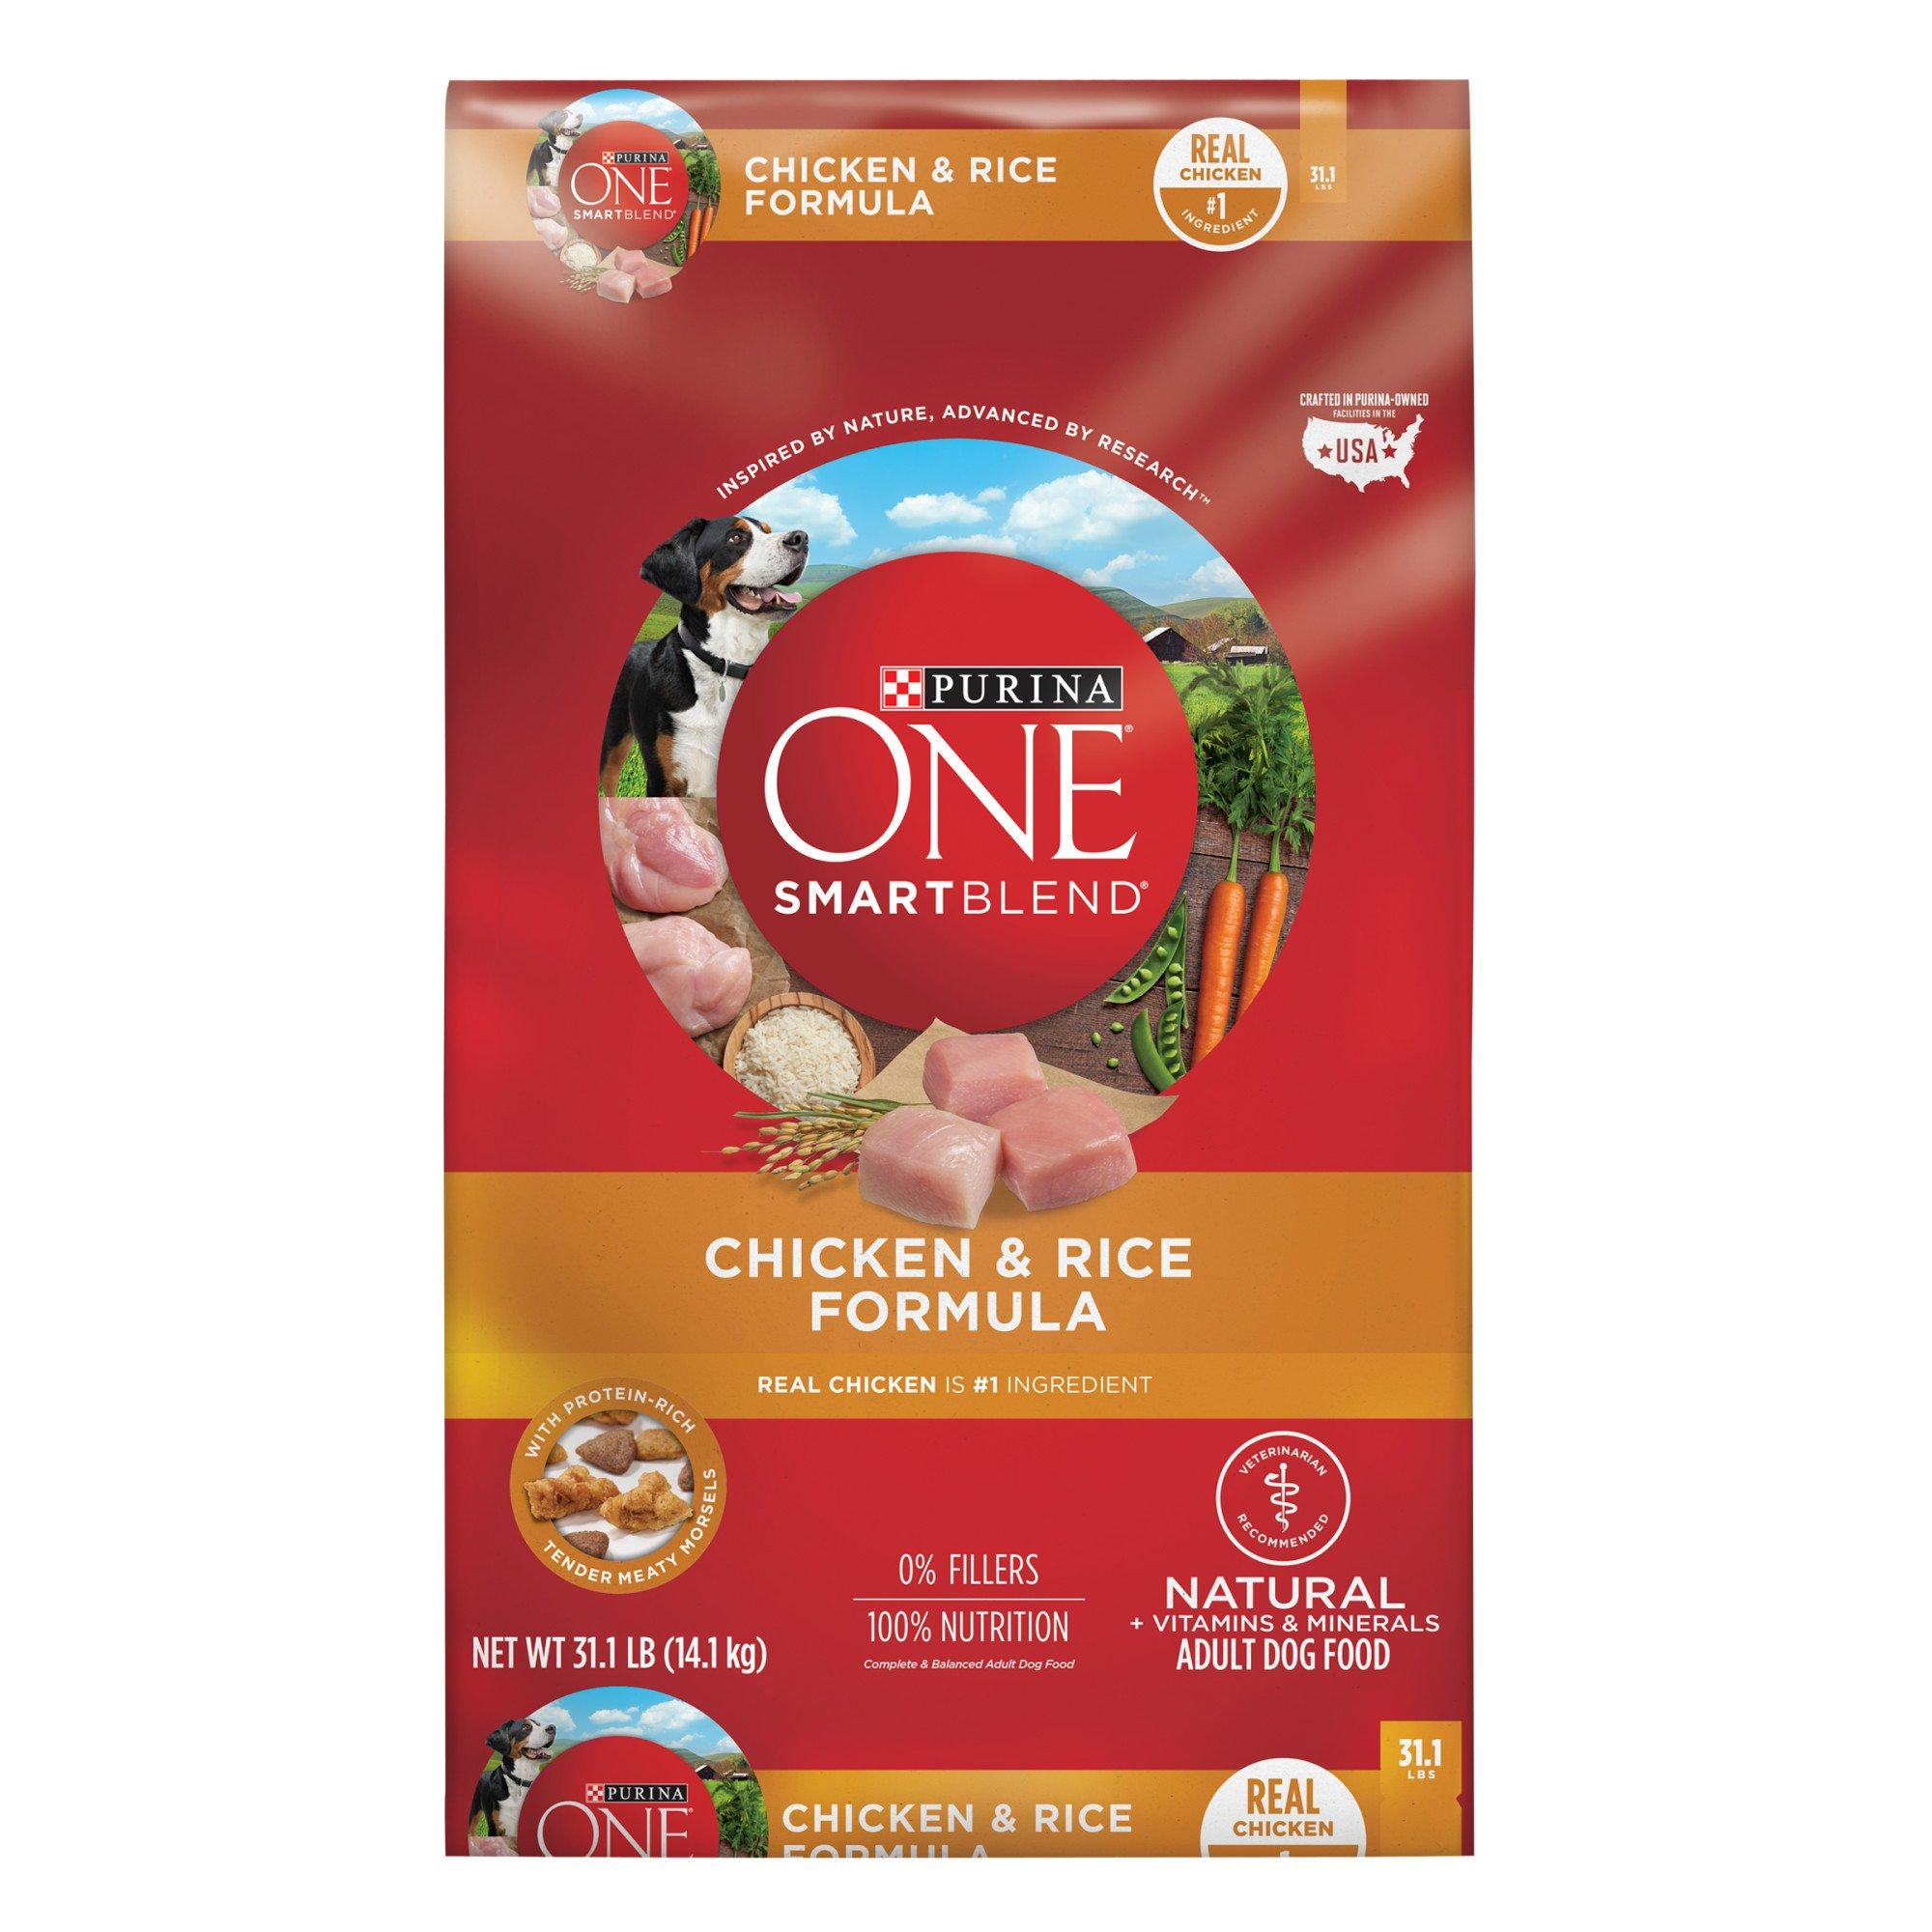 Purina One Smartblend Chicken Amp Rice Formula Dog Food Petco